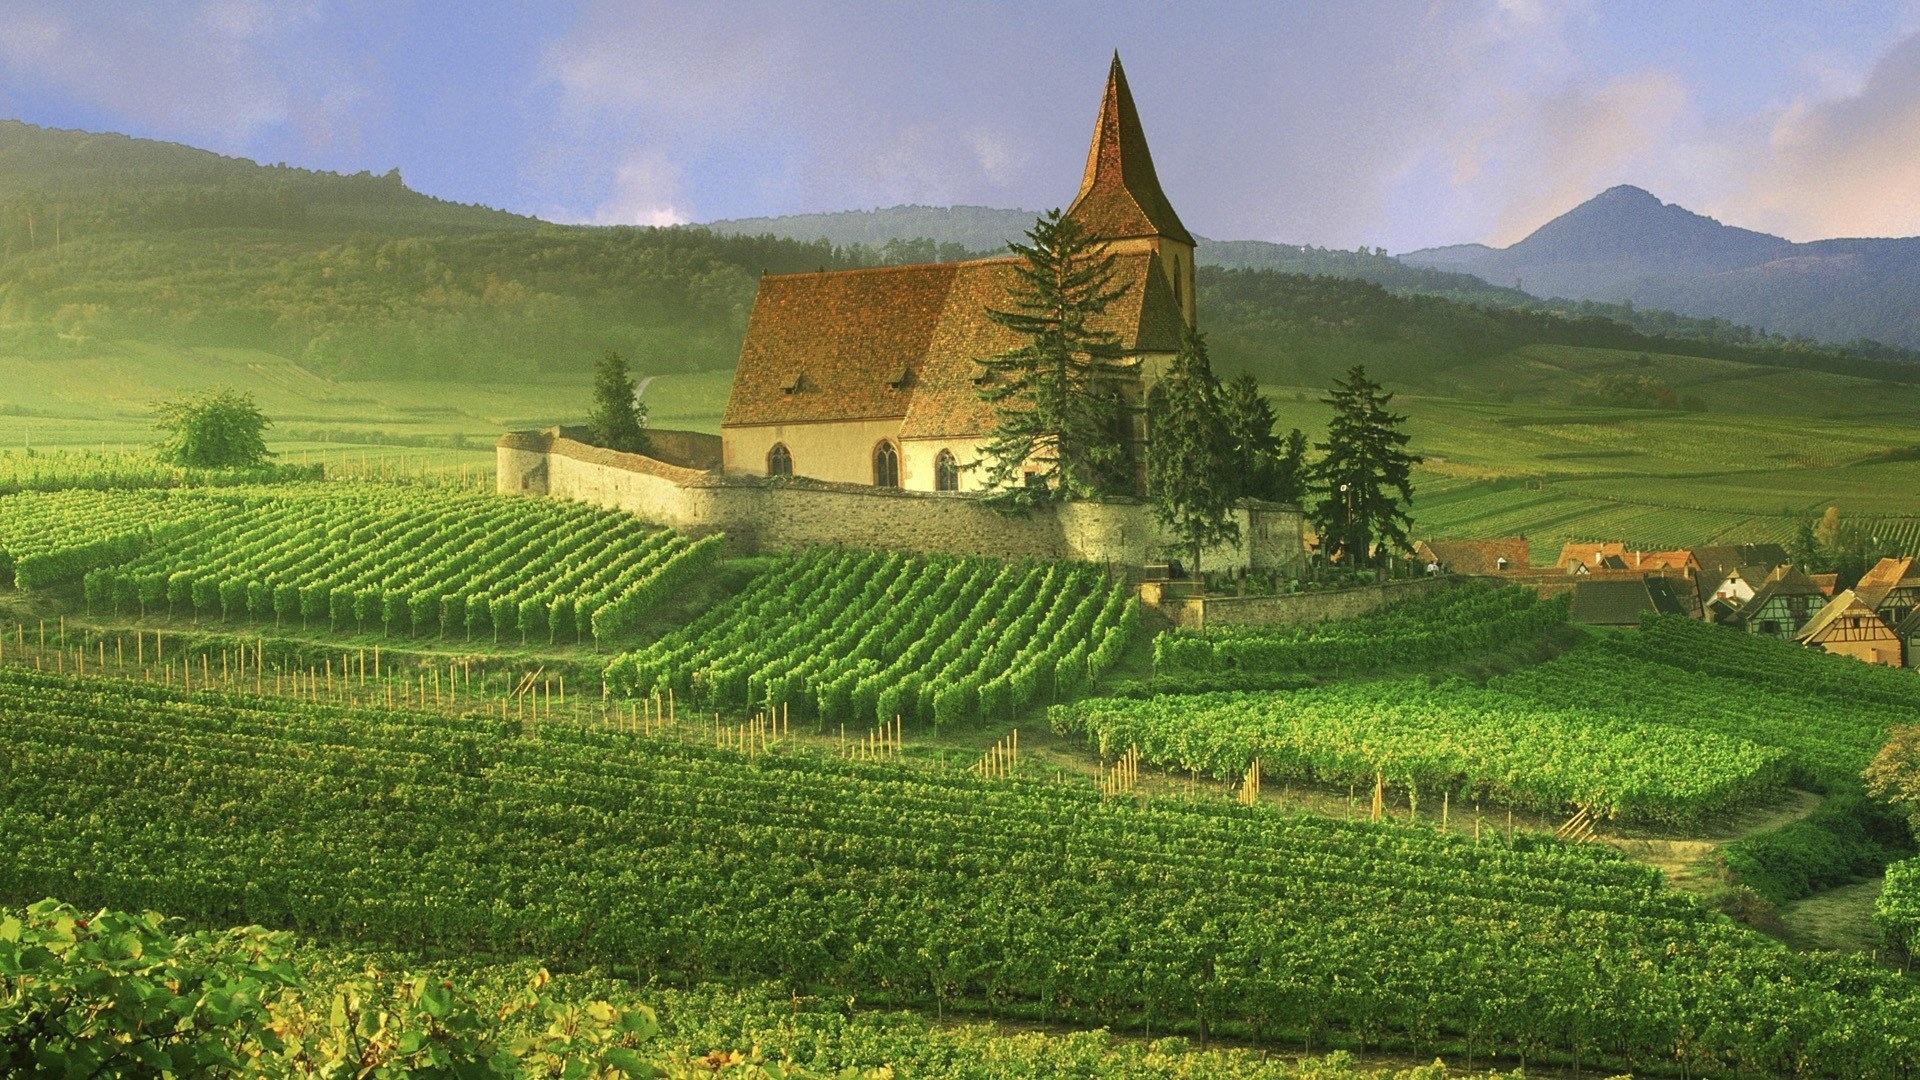 Vineyard wallpaper hd